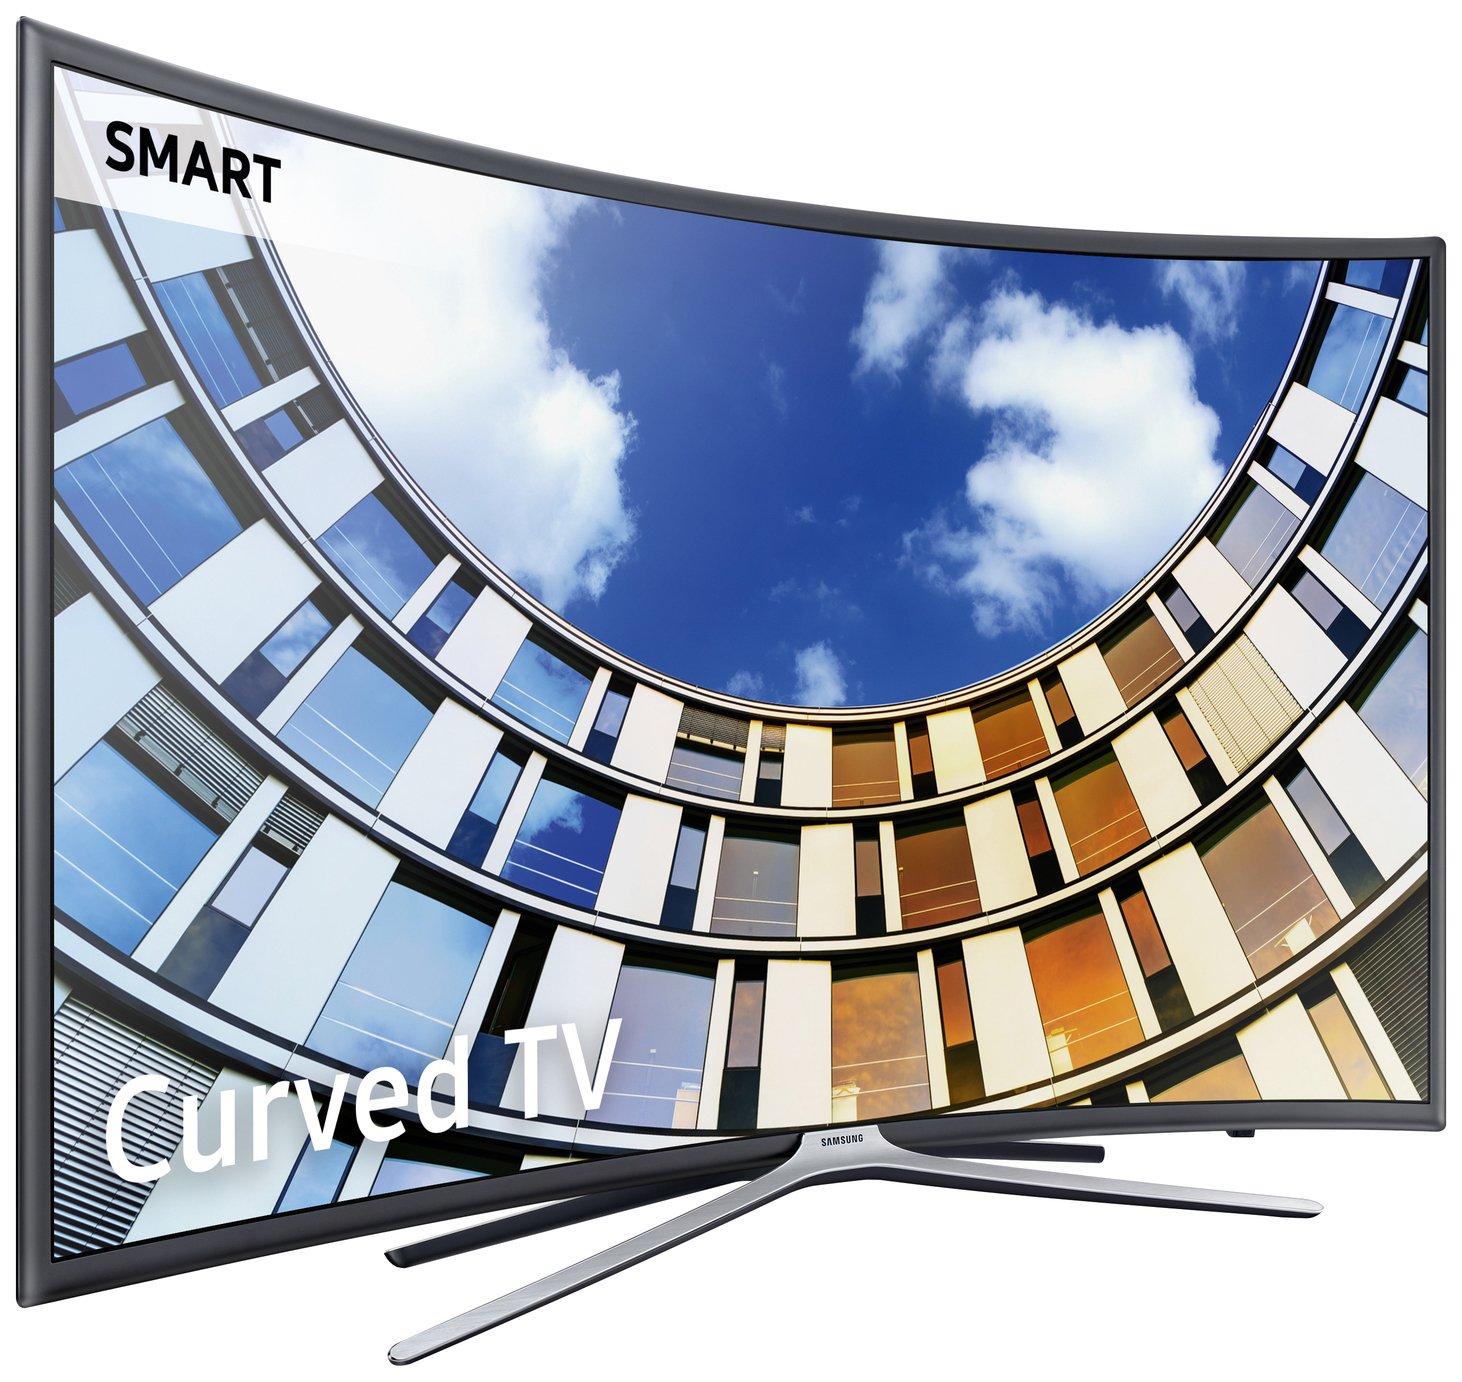 Samsung Samsung 55M6320 55 Inch Curved Full HD Smart TV